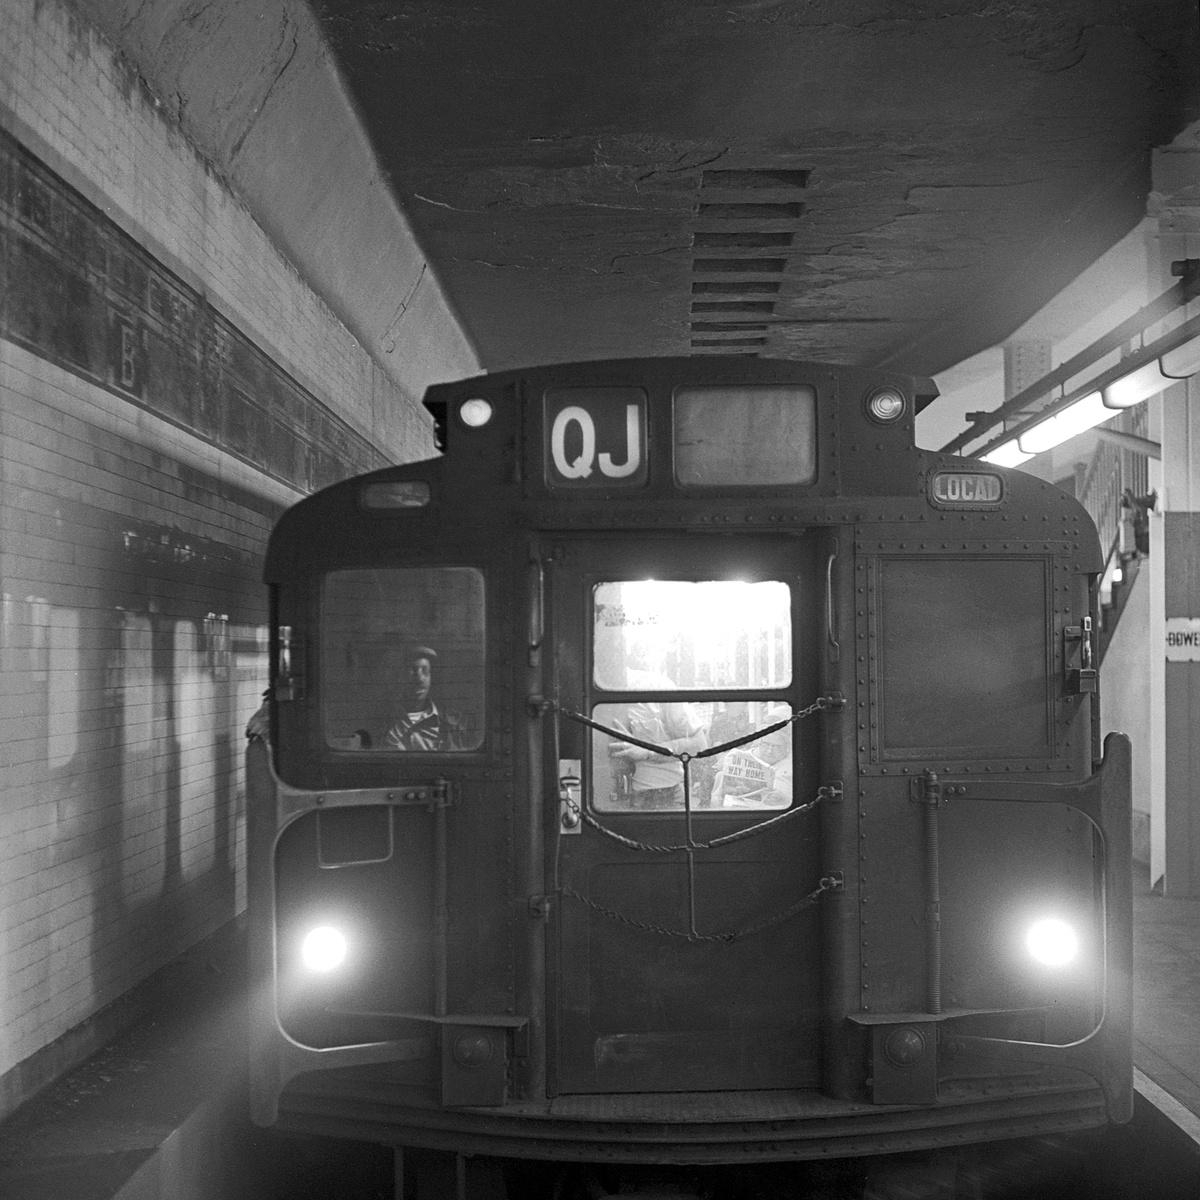 (474k, 1200x1200)<br><b>Country:</b> United States<br><b>City:</b> New York<br><b>System:</b> New York City Transit<br><b>Line:</b> BMT Nassau Street/Jamaica Line<br><b>Location:</b> Bowery <br><b>Route:</b> QJ<br><b>Car:</b> R-9 Series (Number Unknown)  <br><b>Collection of:</b> David Pirmann<br><b>Date:</b> 7/22/1969<br><b>Viewed (this week/total):</b> 11 / 104